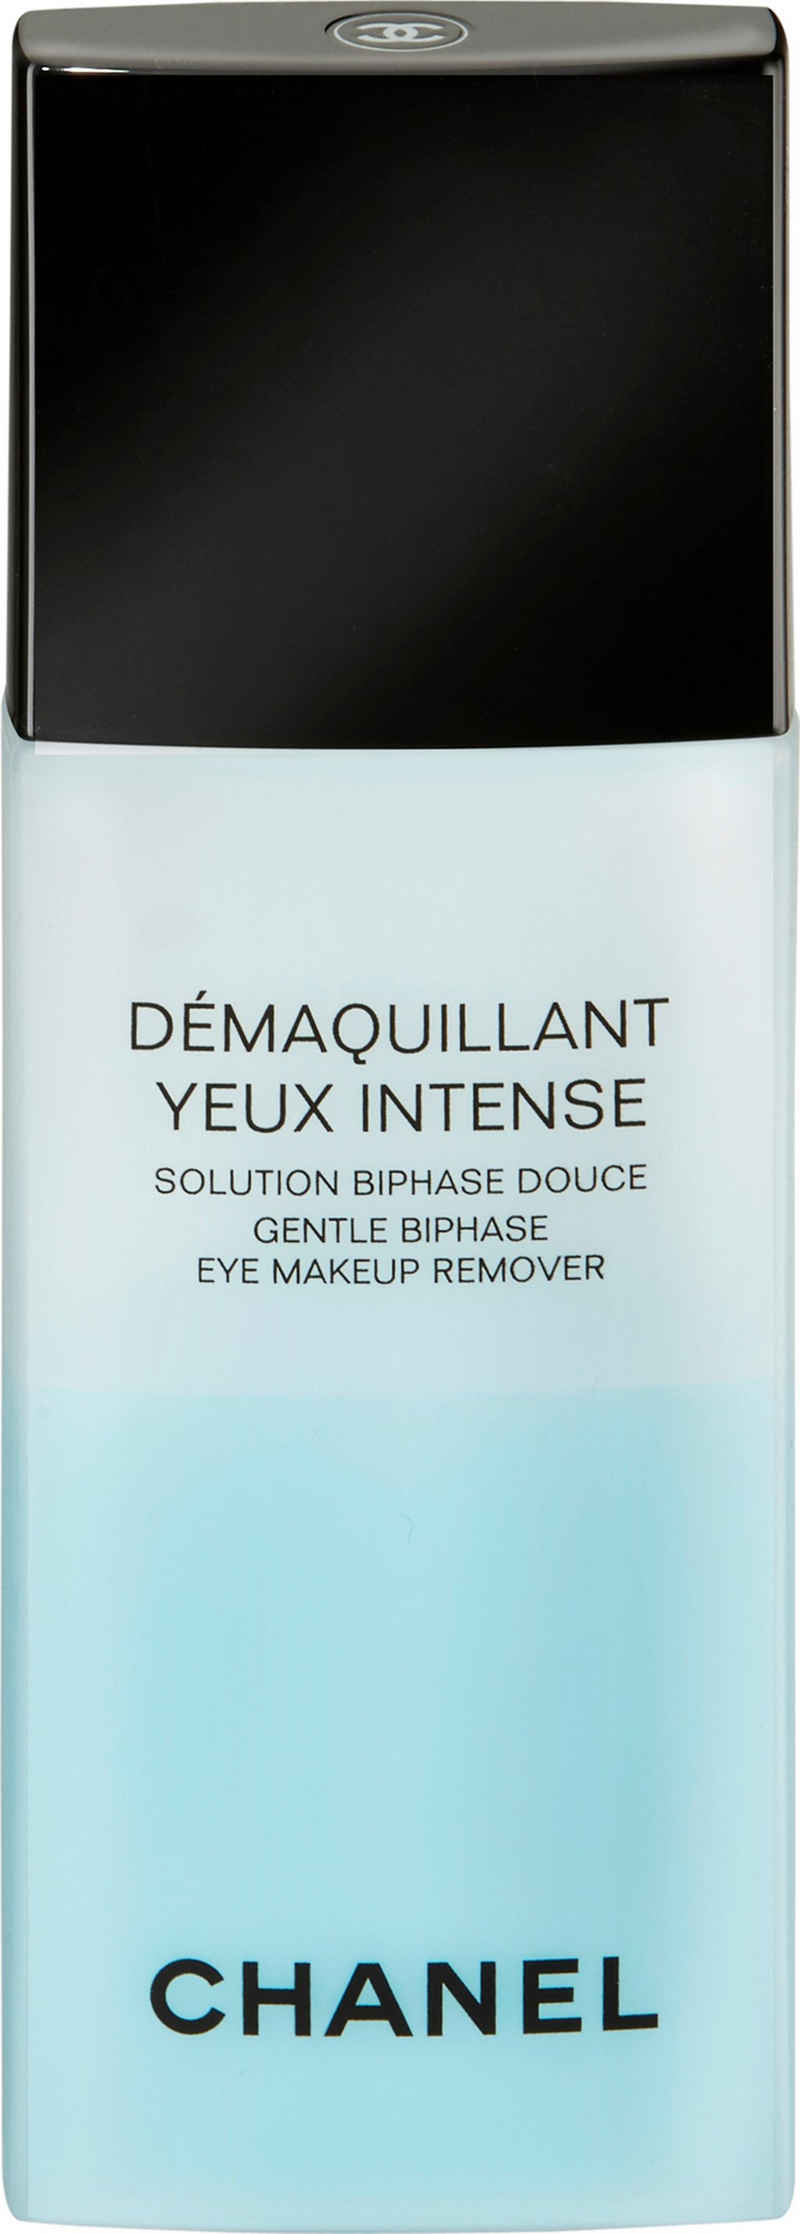 CHANEL Augen-Make-up-Entferner »Démaquillant Yeux Intense«